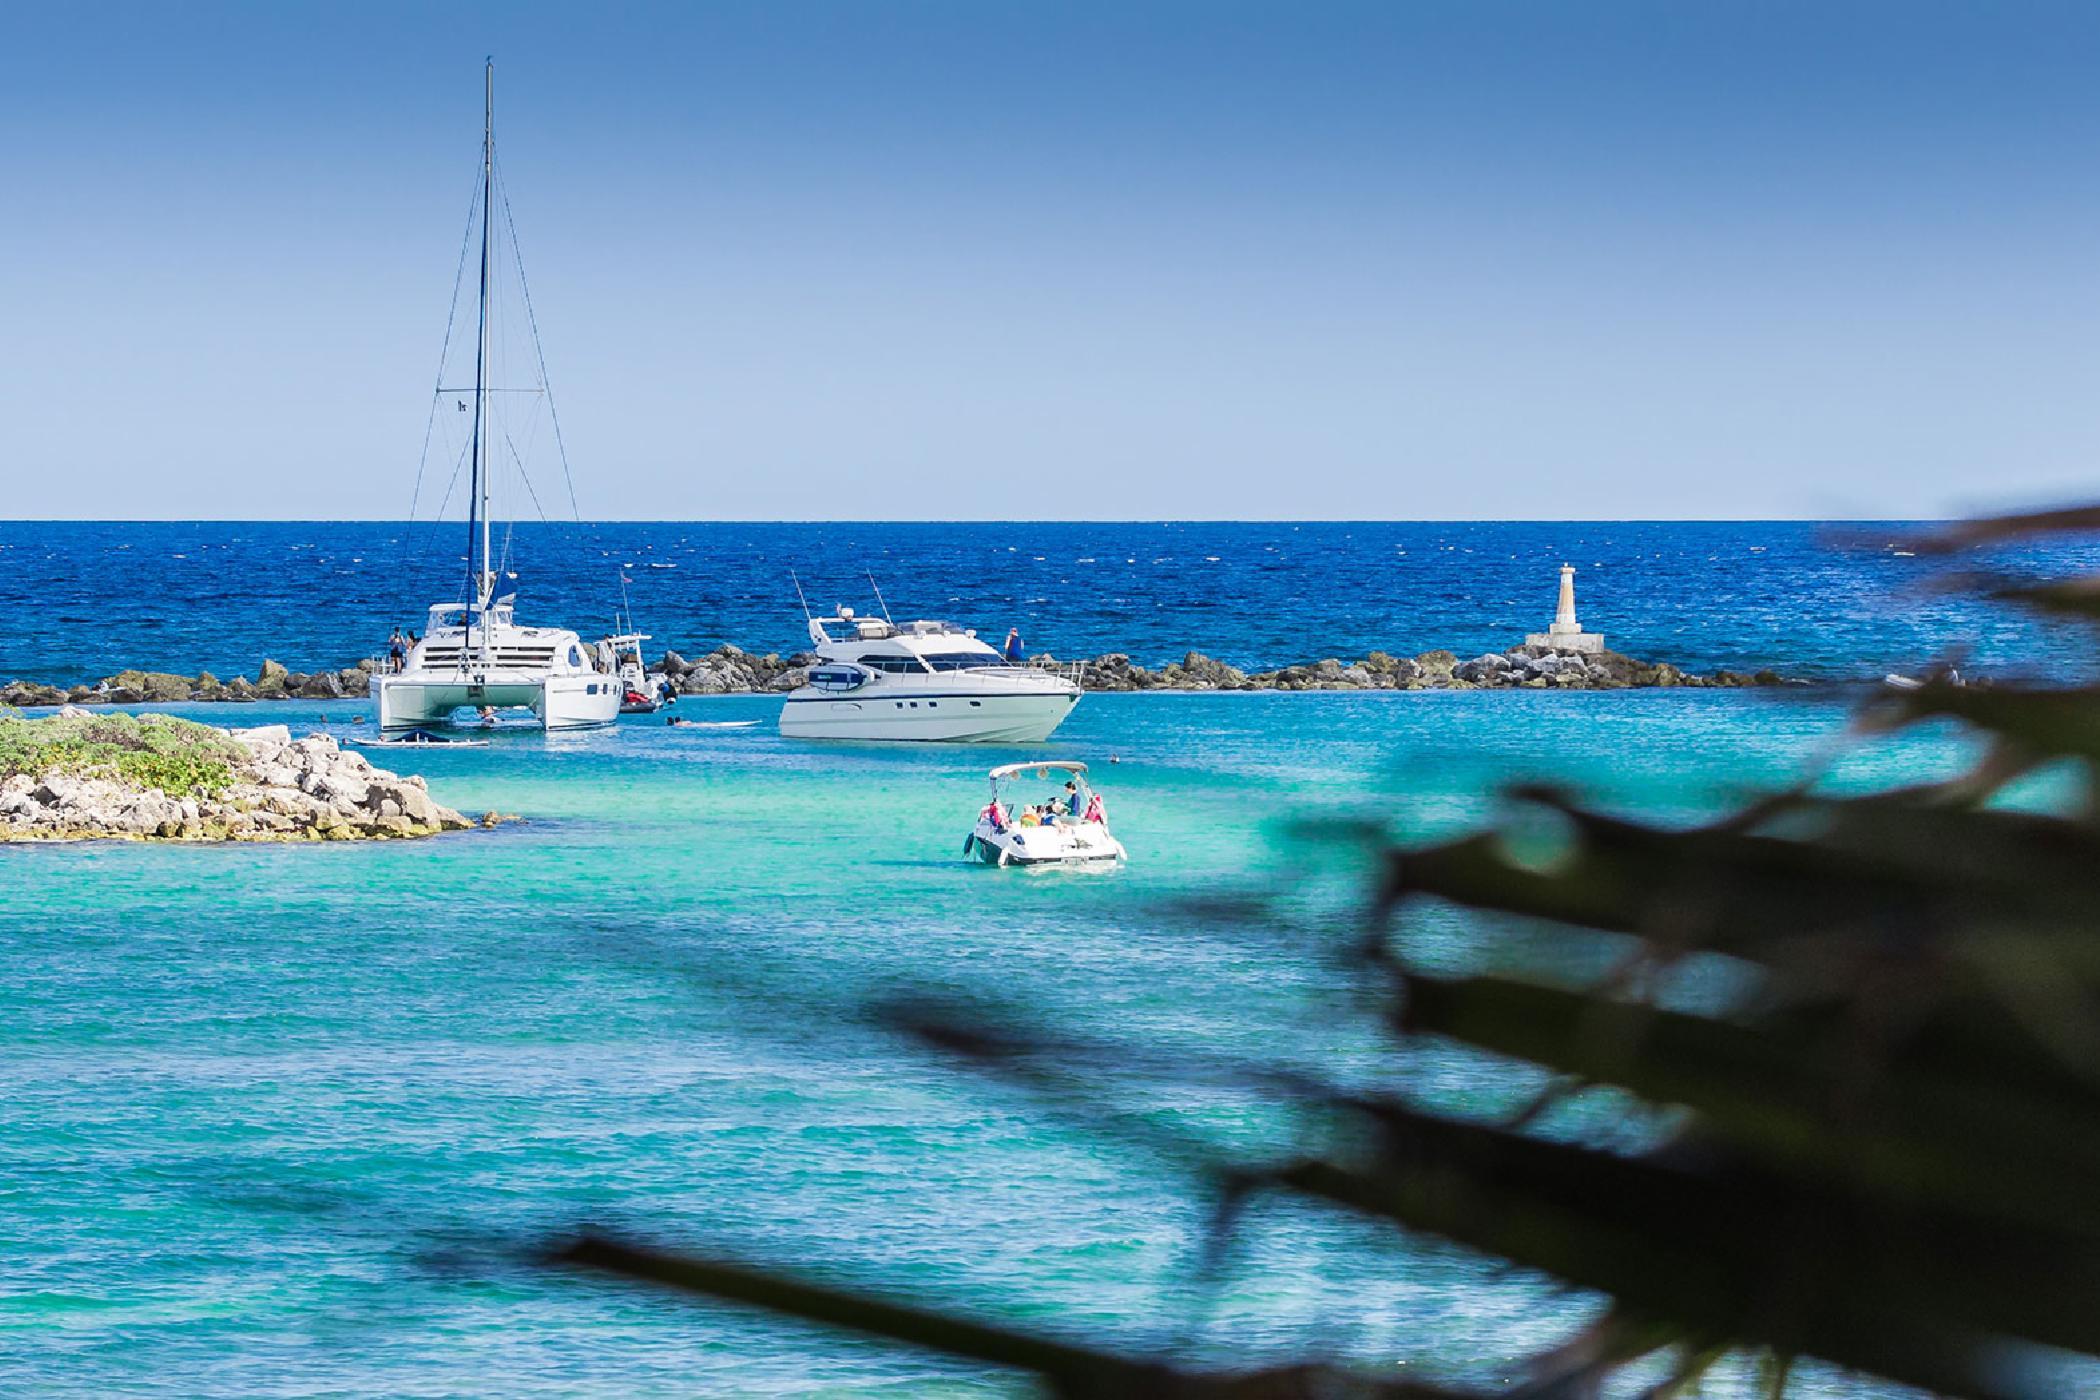 Maya_Luxe_Riviera_Maya_Luxury_Villas_Experiences_Puerto_Aventuras_5_Bedrooms_Zacil_Na_5.jpg